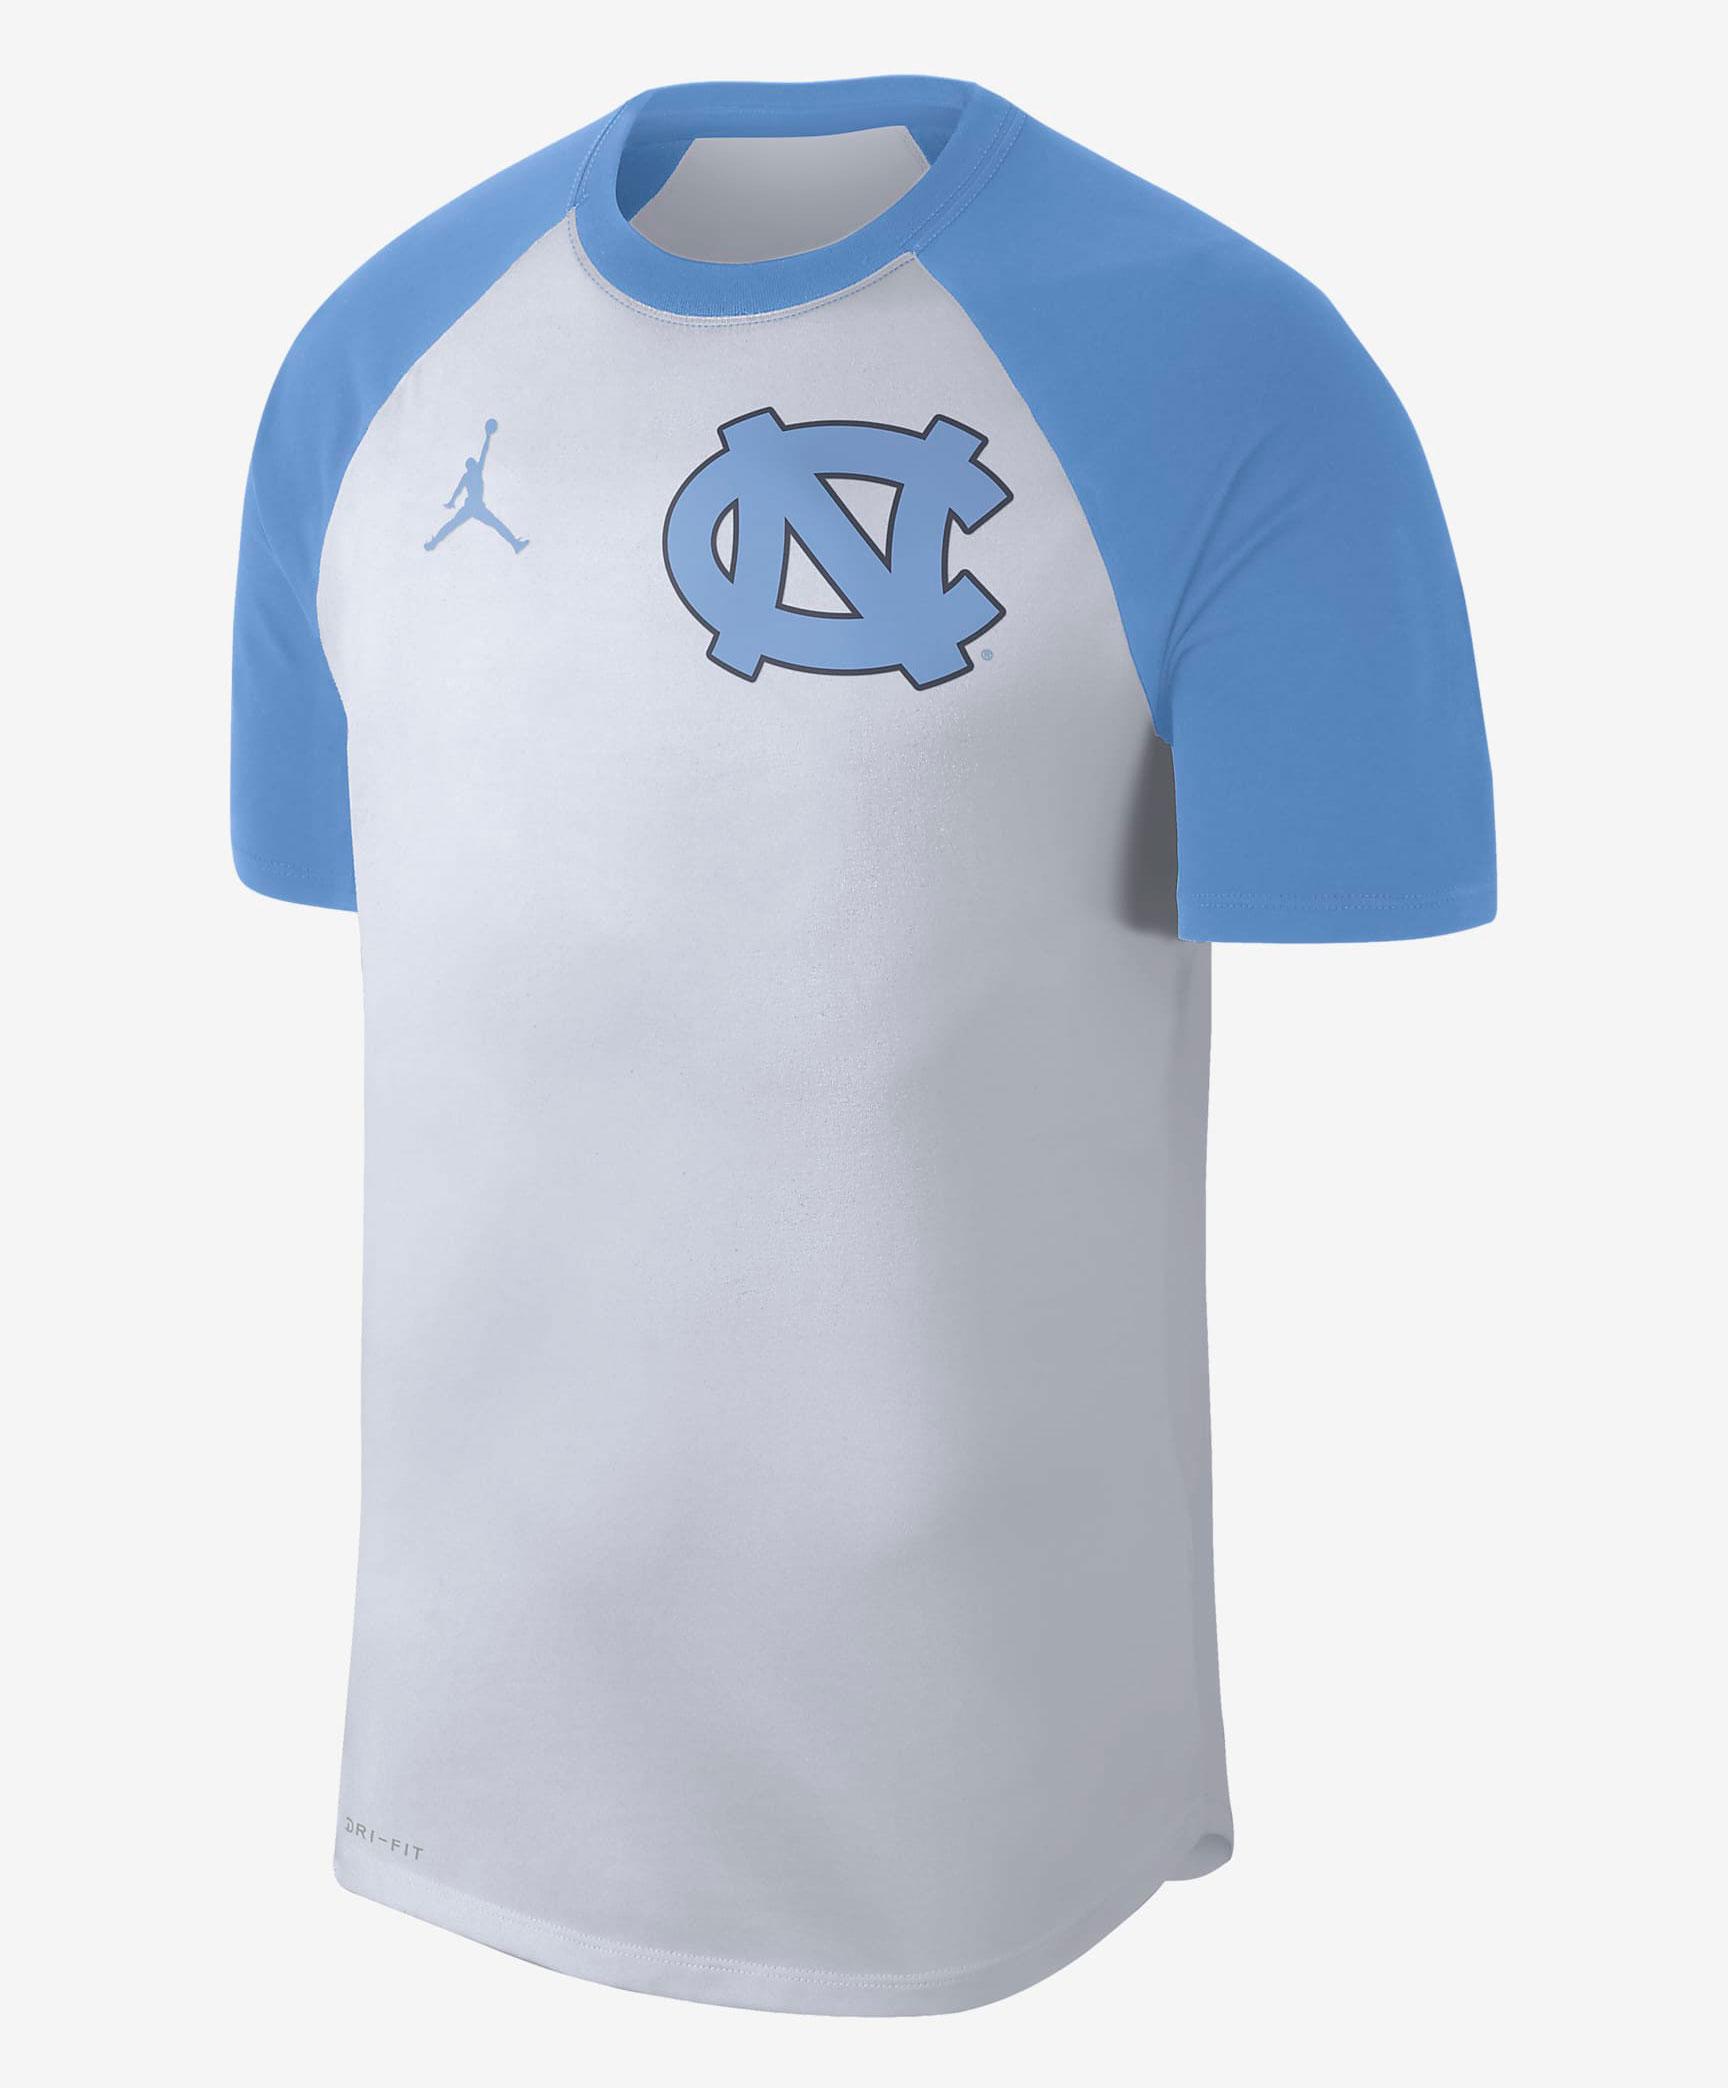 jordan-university-blue-unc-raglan-shirt